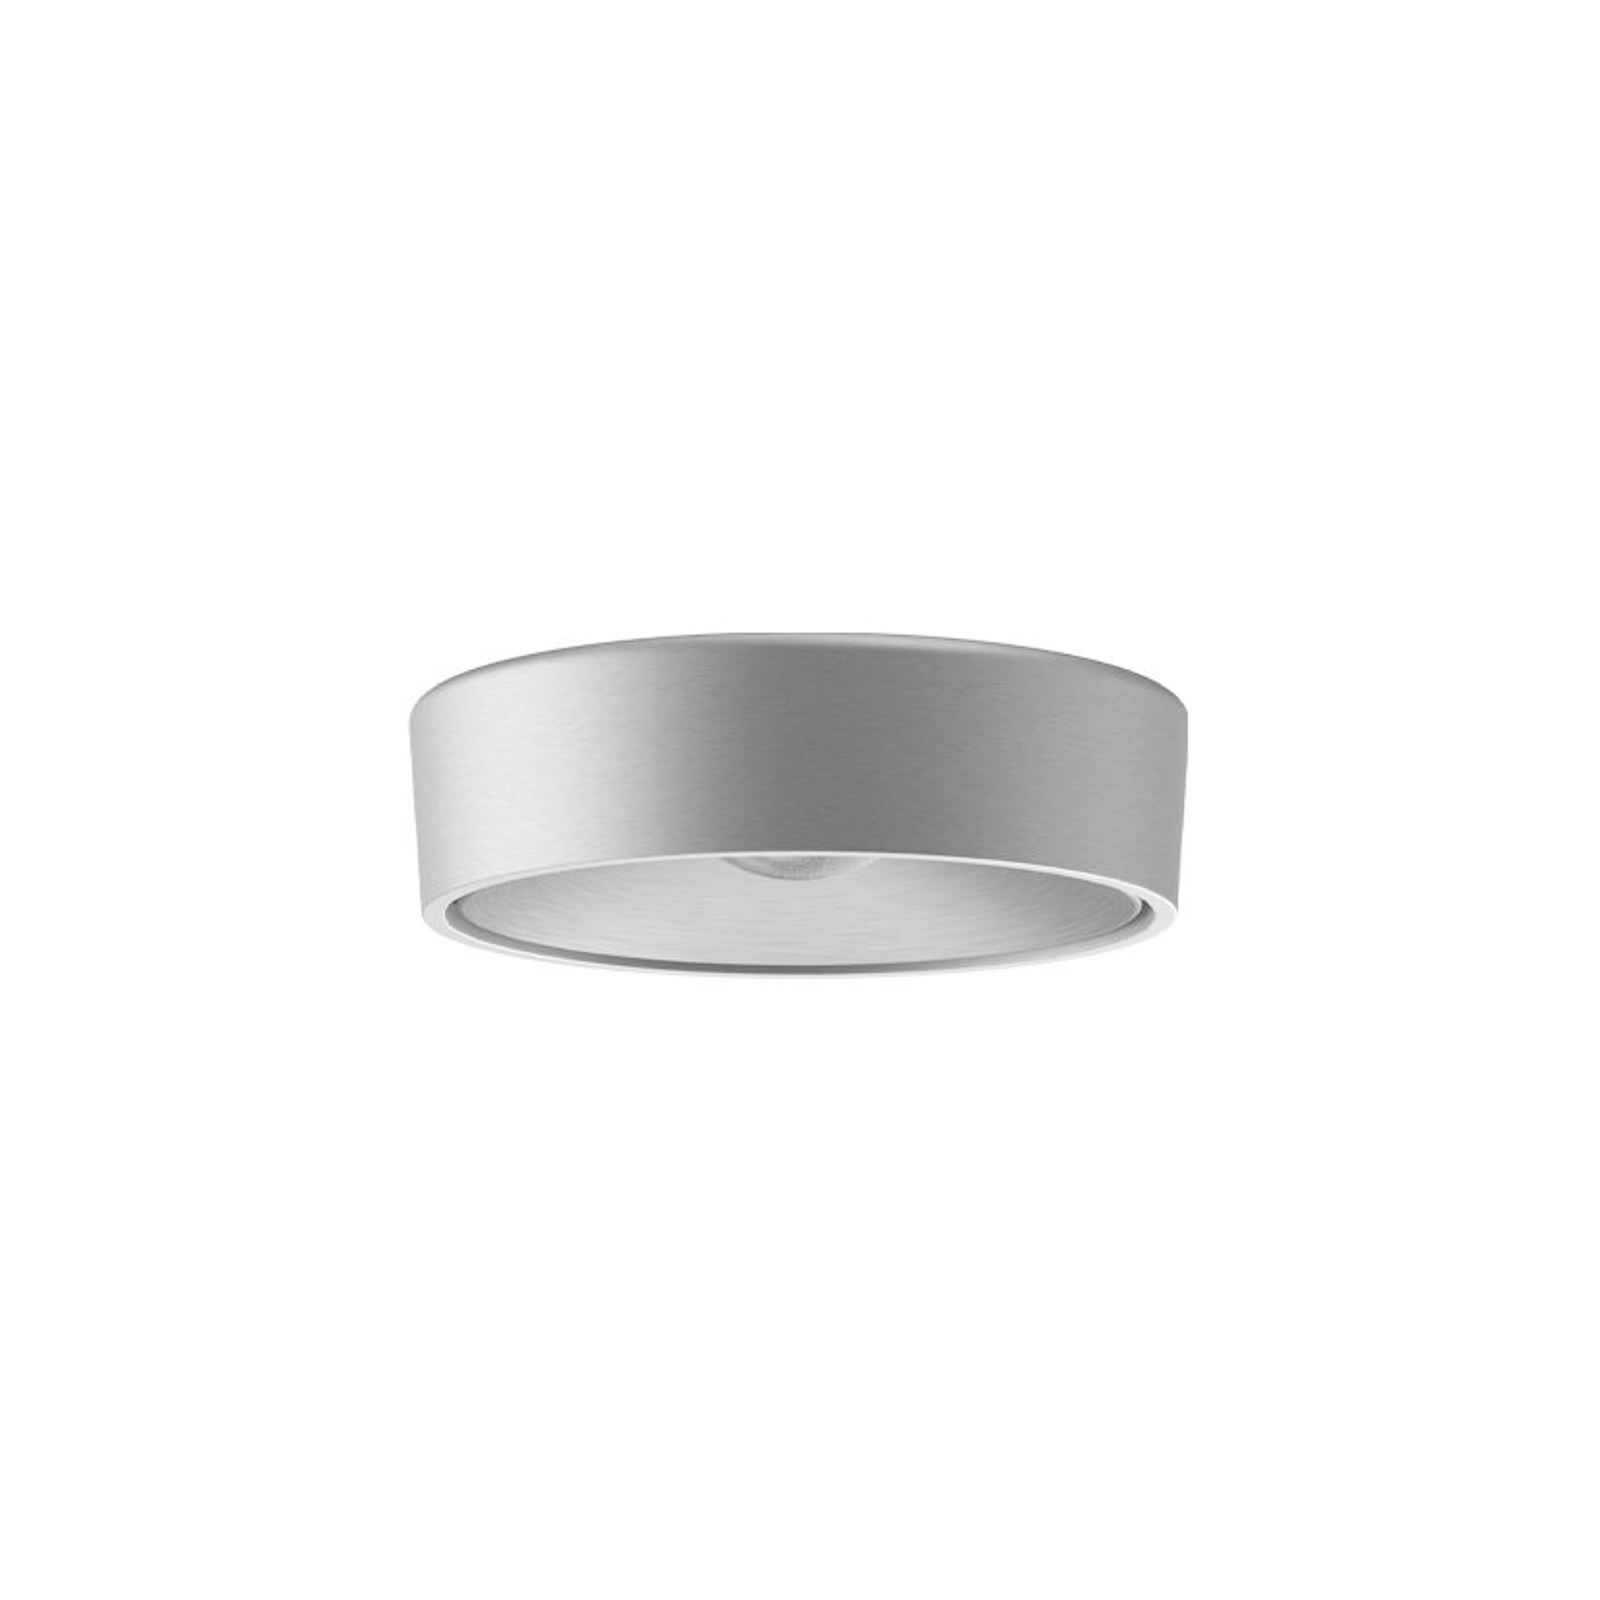 Ribag Kivo Deckenlampe Phase Cut 14cm 2.700K grau